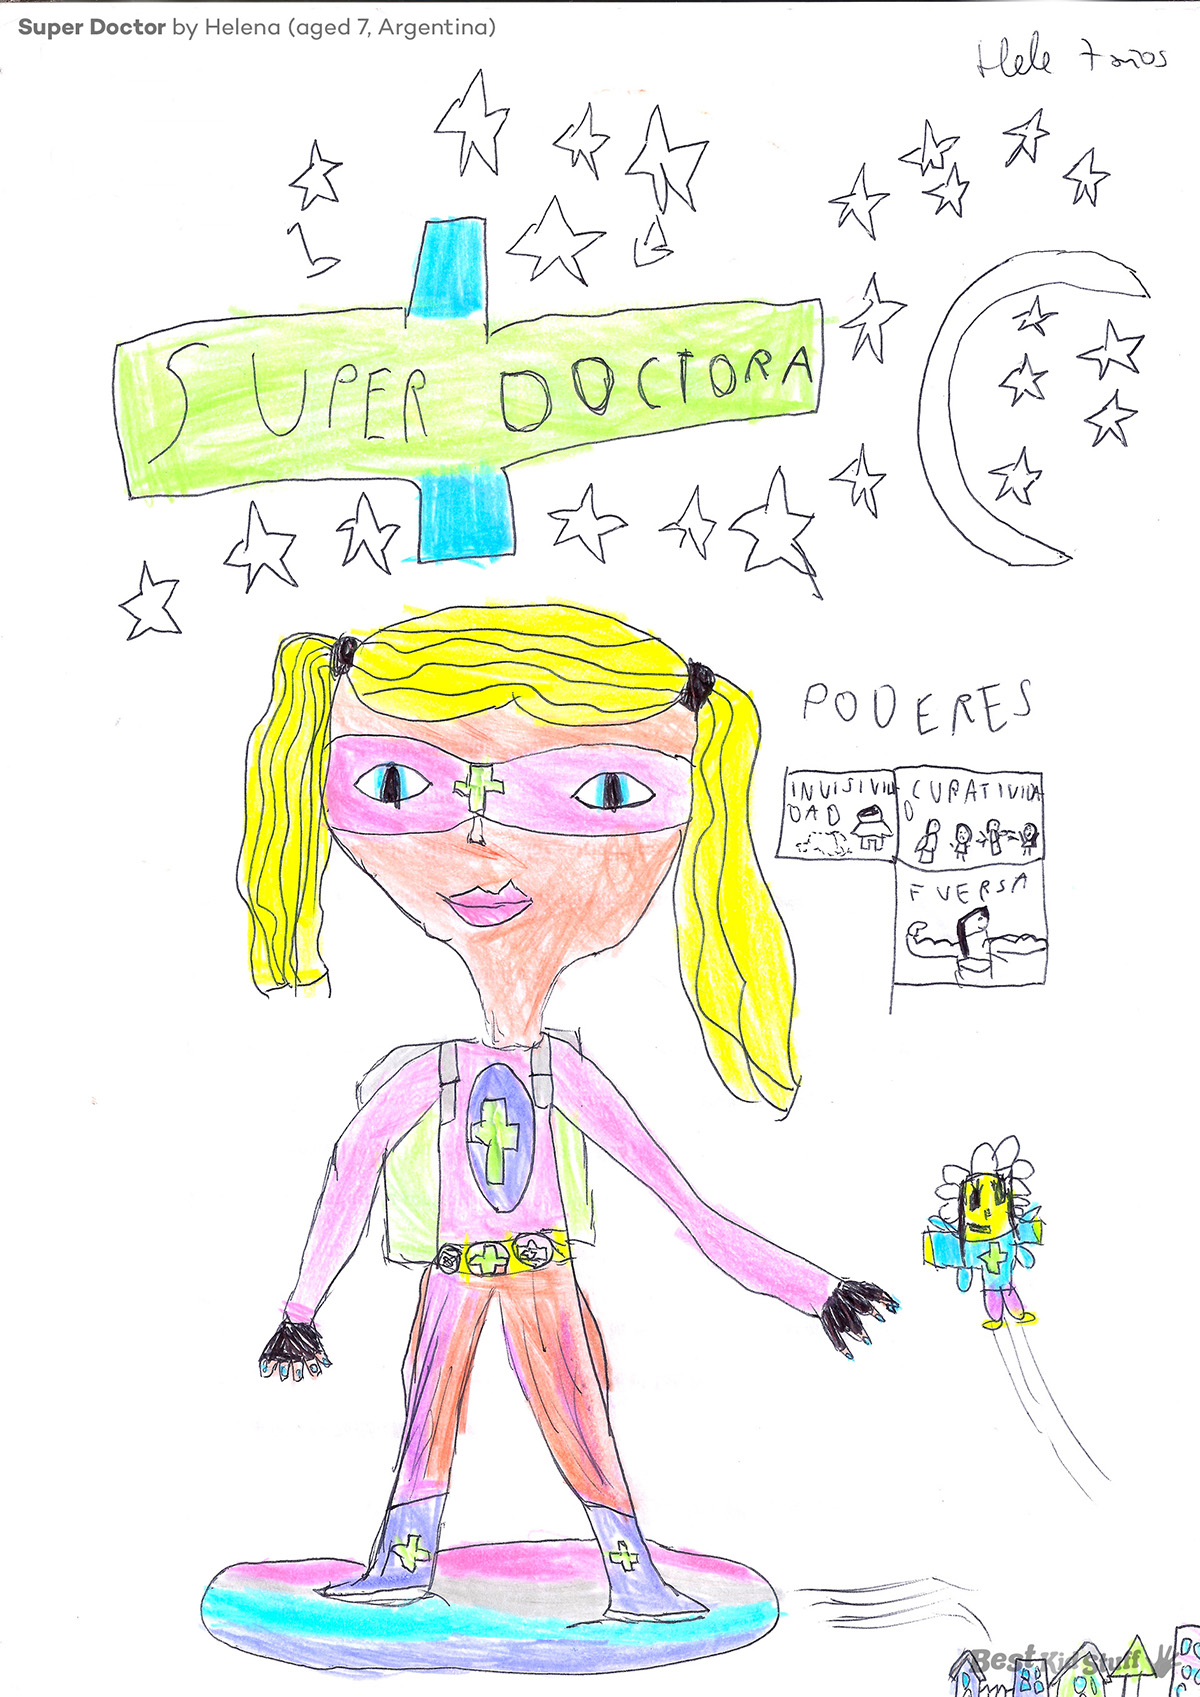 06 New League of Superheroes Super Doctor Original